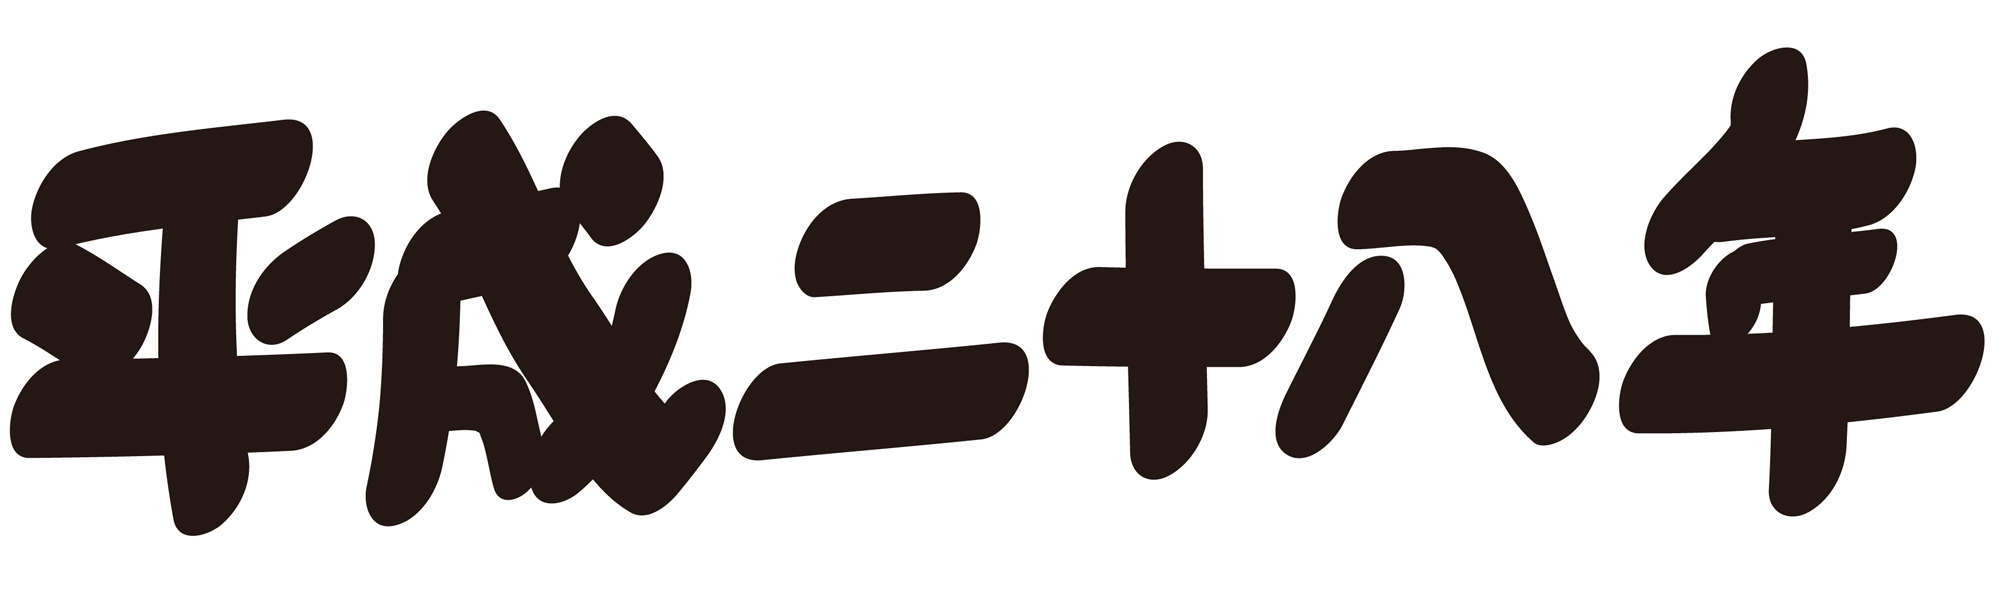 平成二十八年手書き文字年賀状